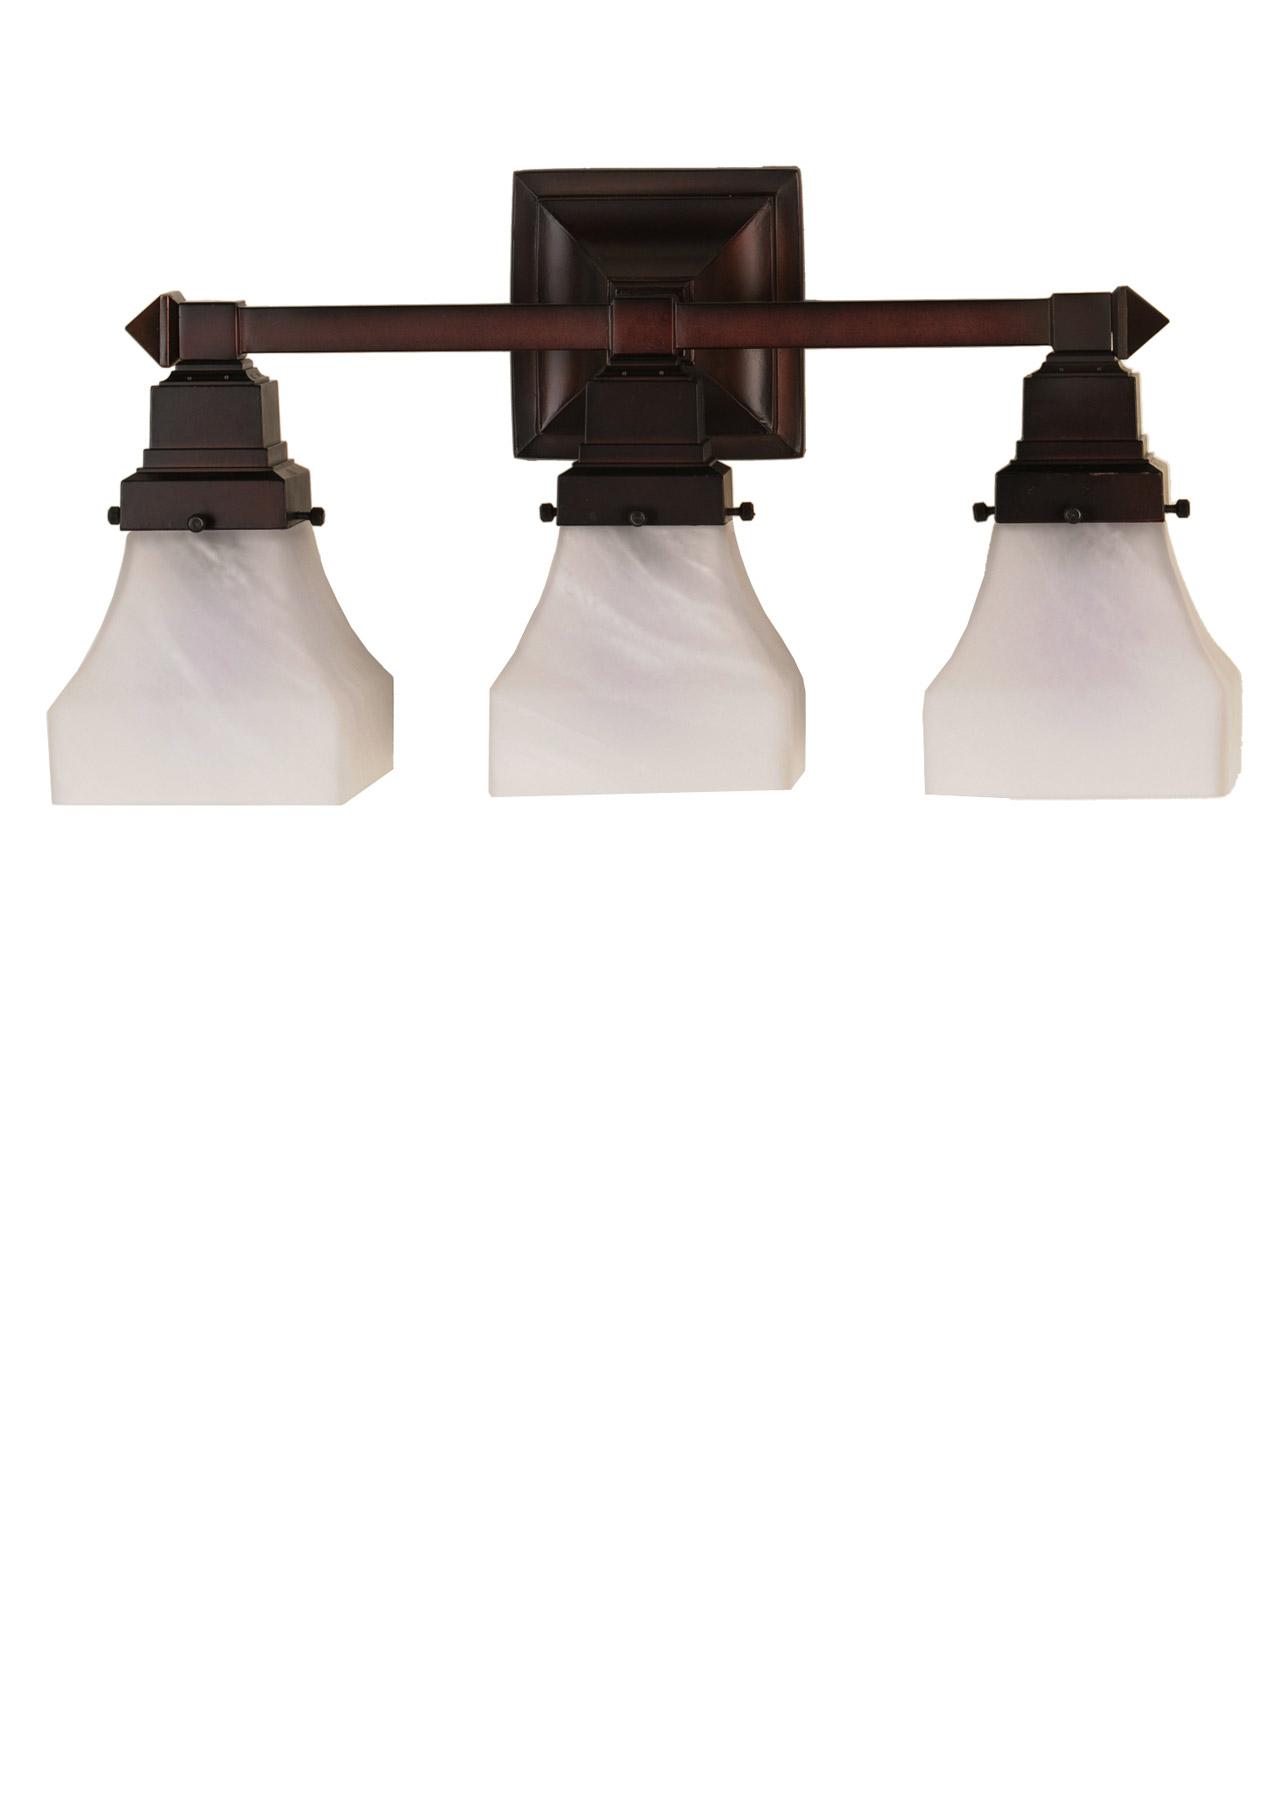 Craftsman Style Bathroom Lighting : Cool craftsman bathroom lighting eyagci